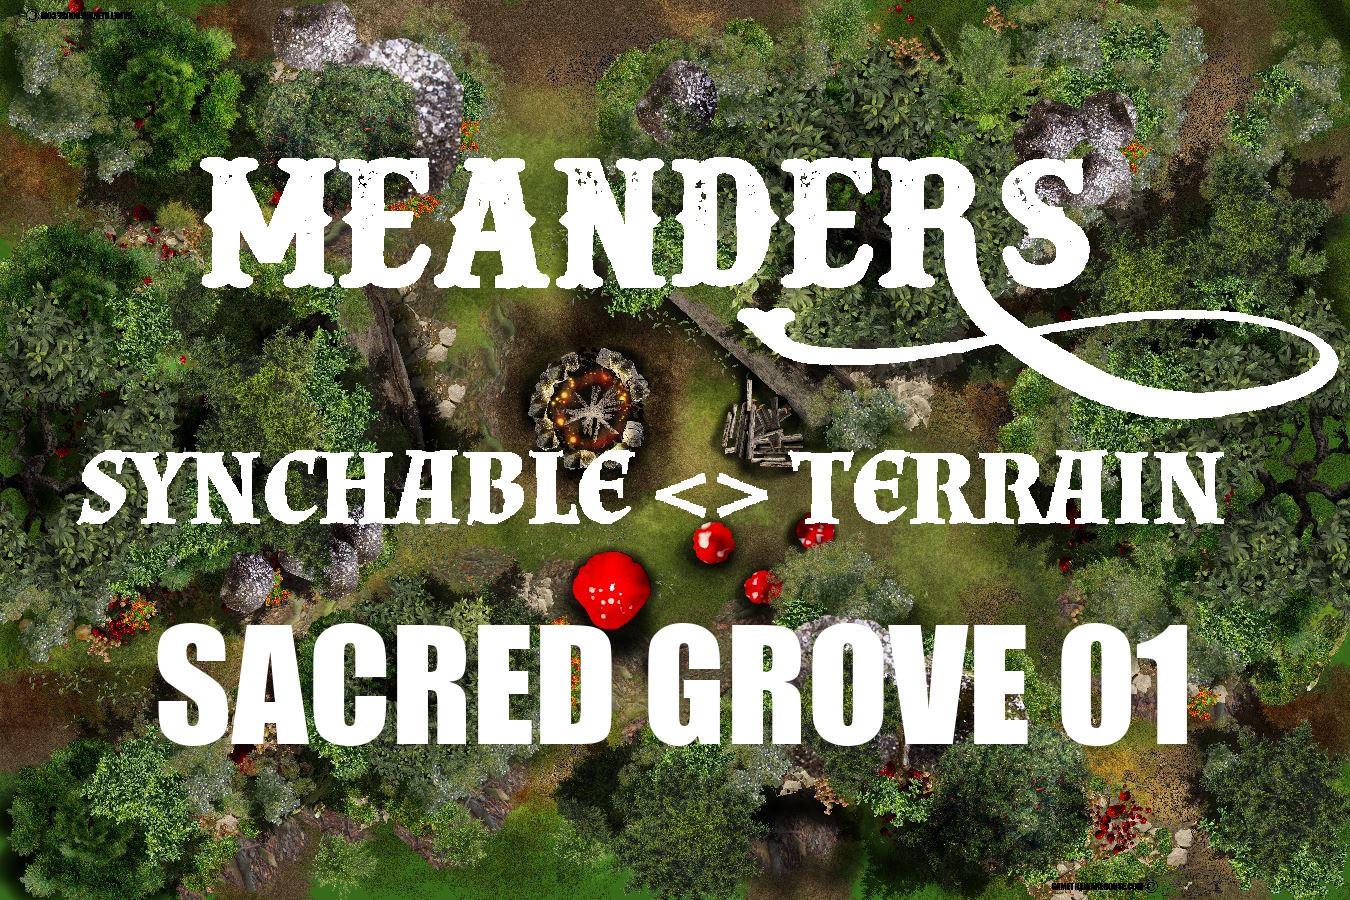 Sacred Grove 01